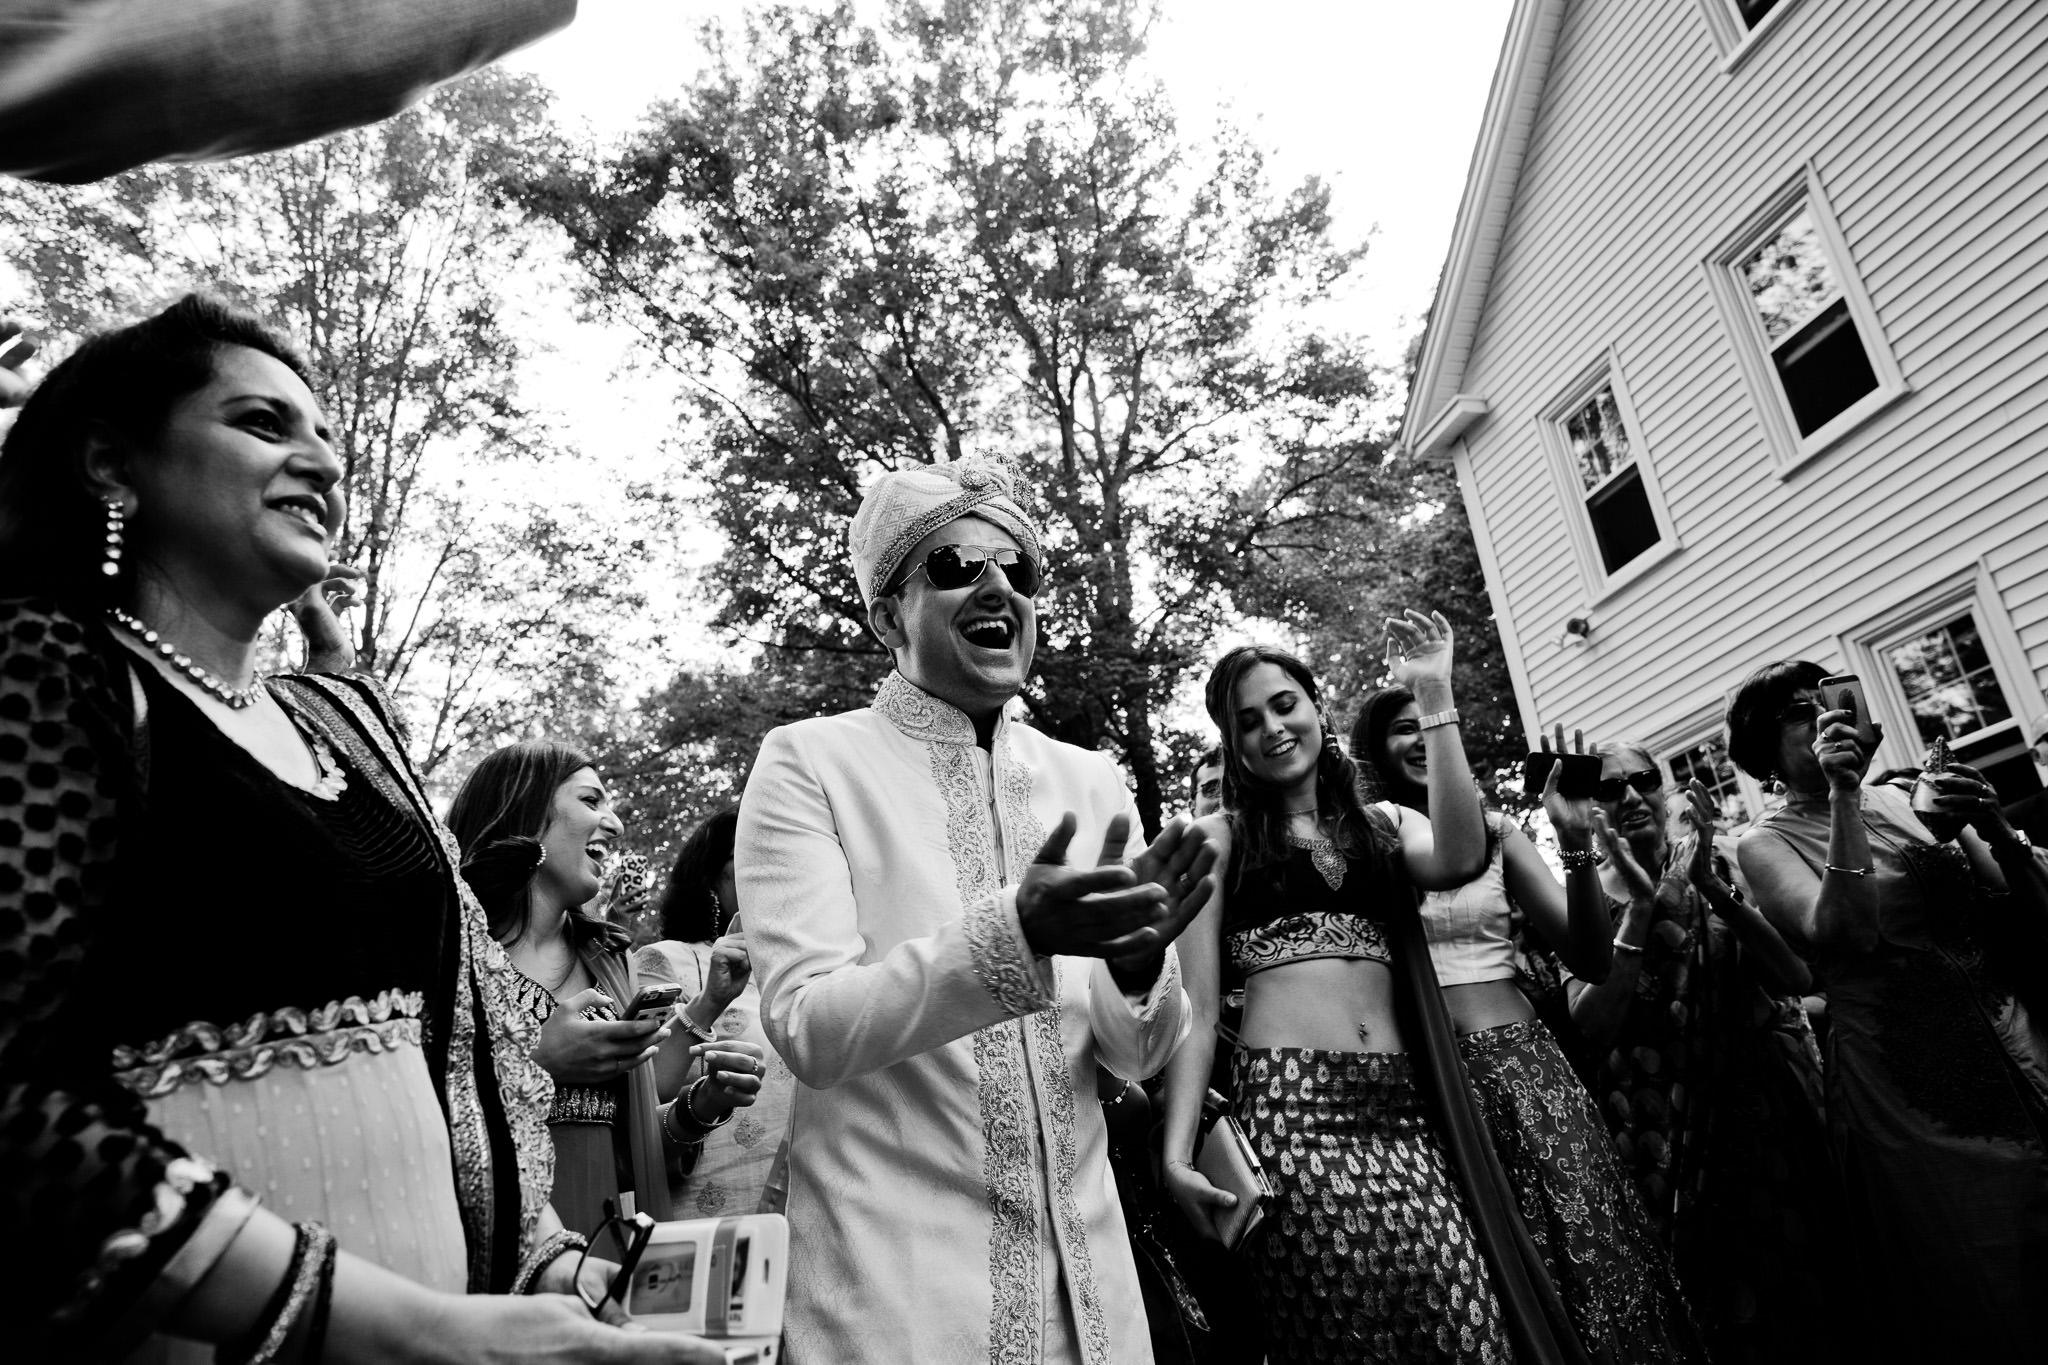 028_Canada-documentary-wedding-photograp